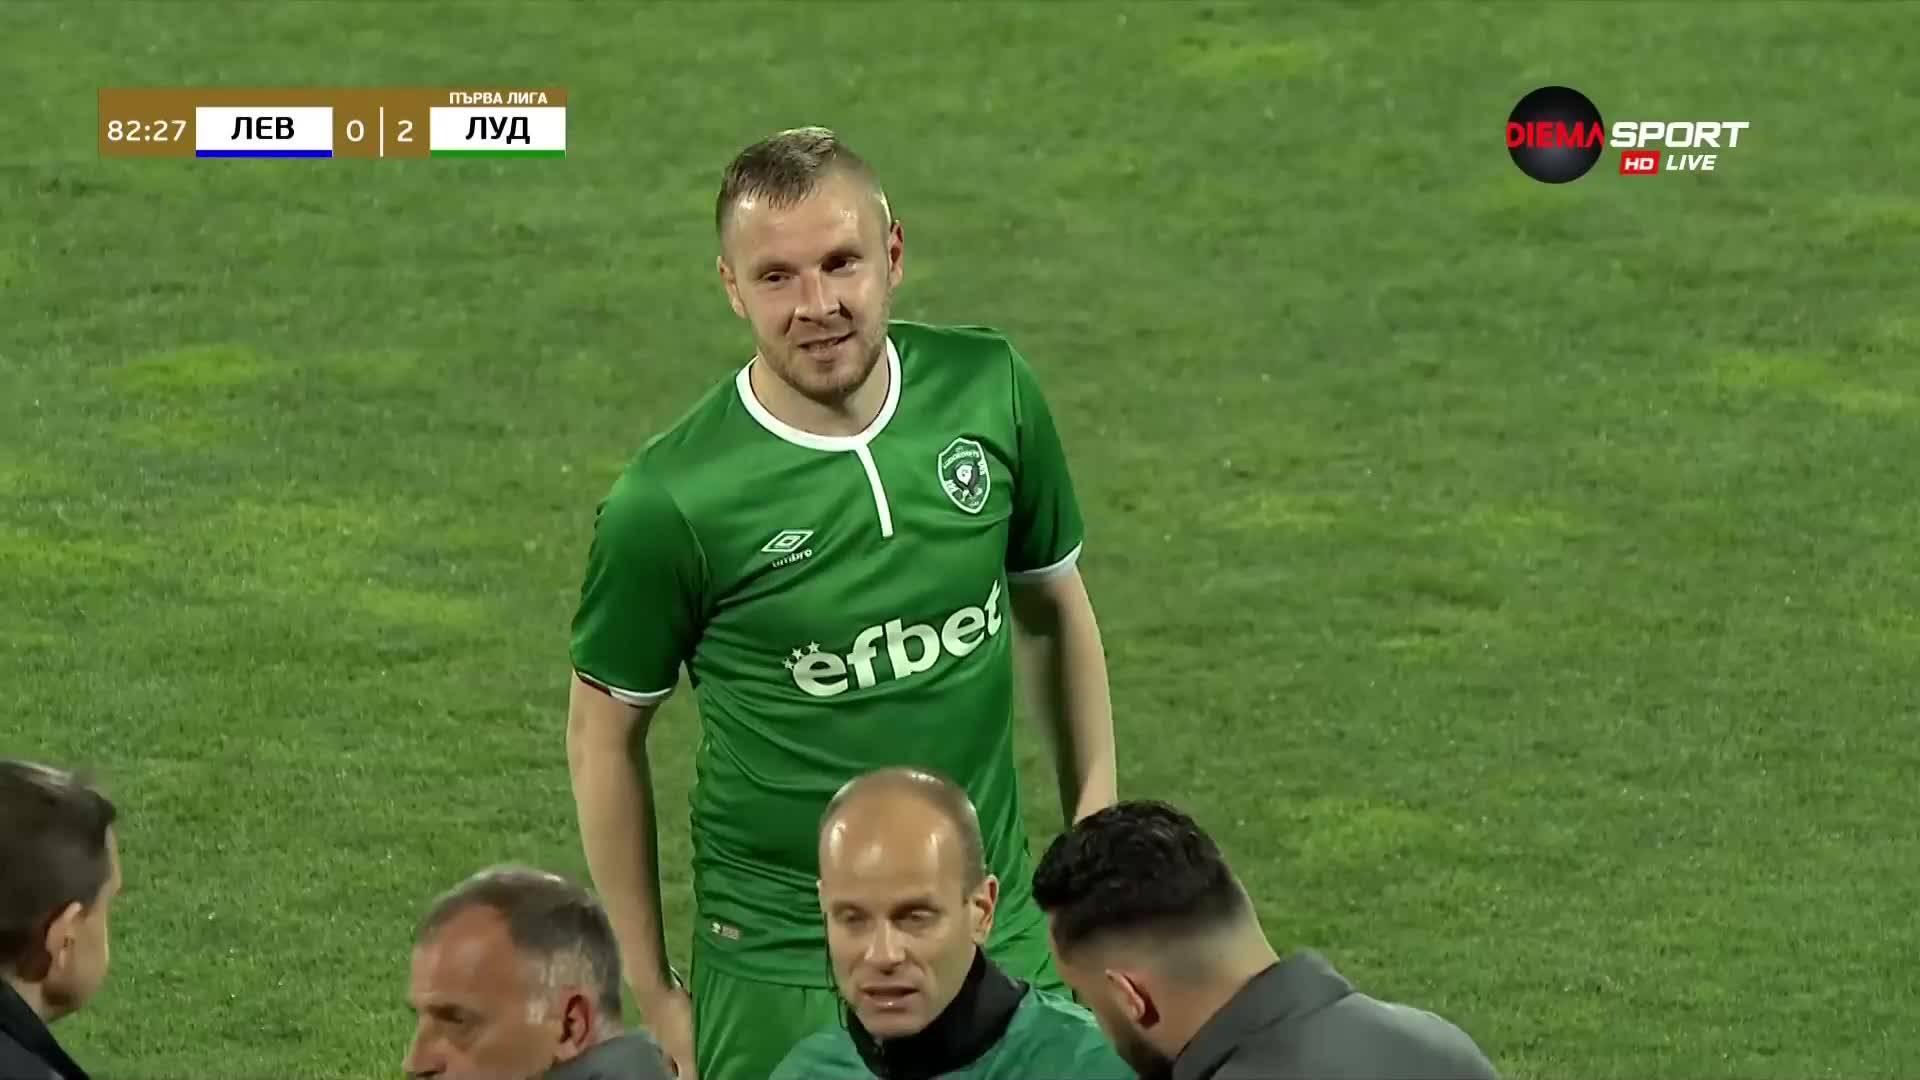 Ненужната радост на Моци го изгони от мача с Левски